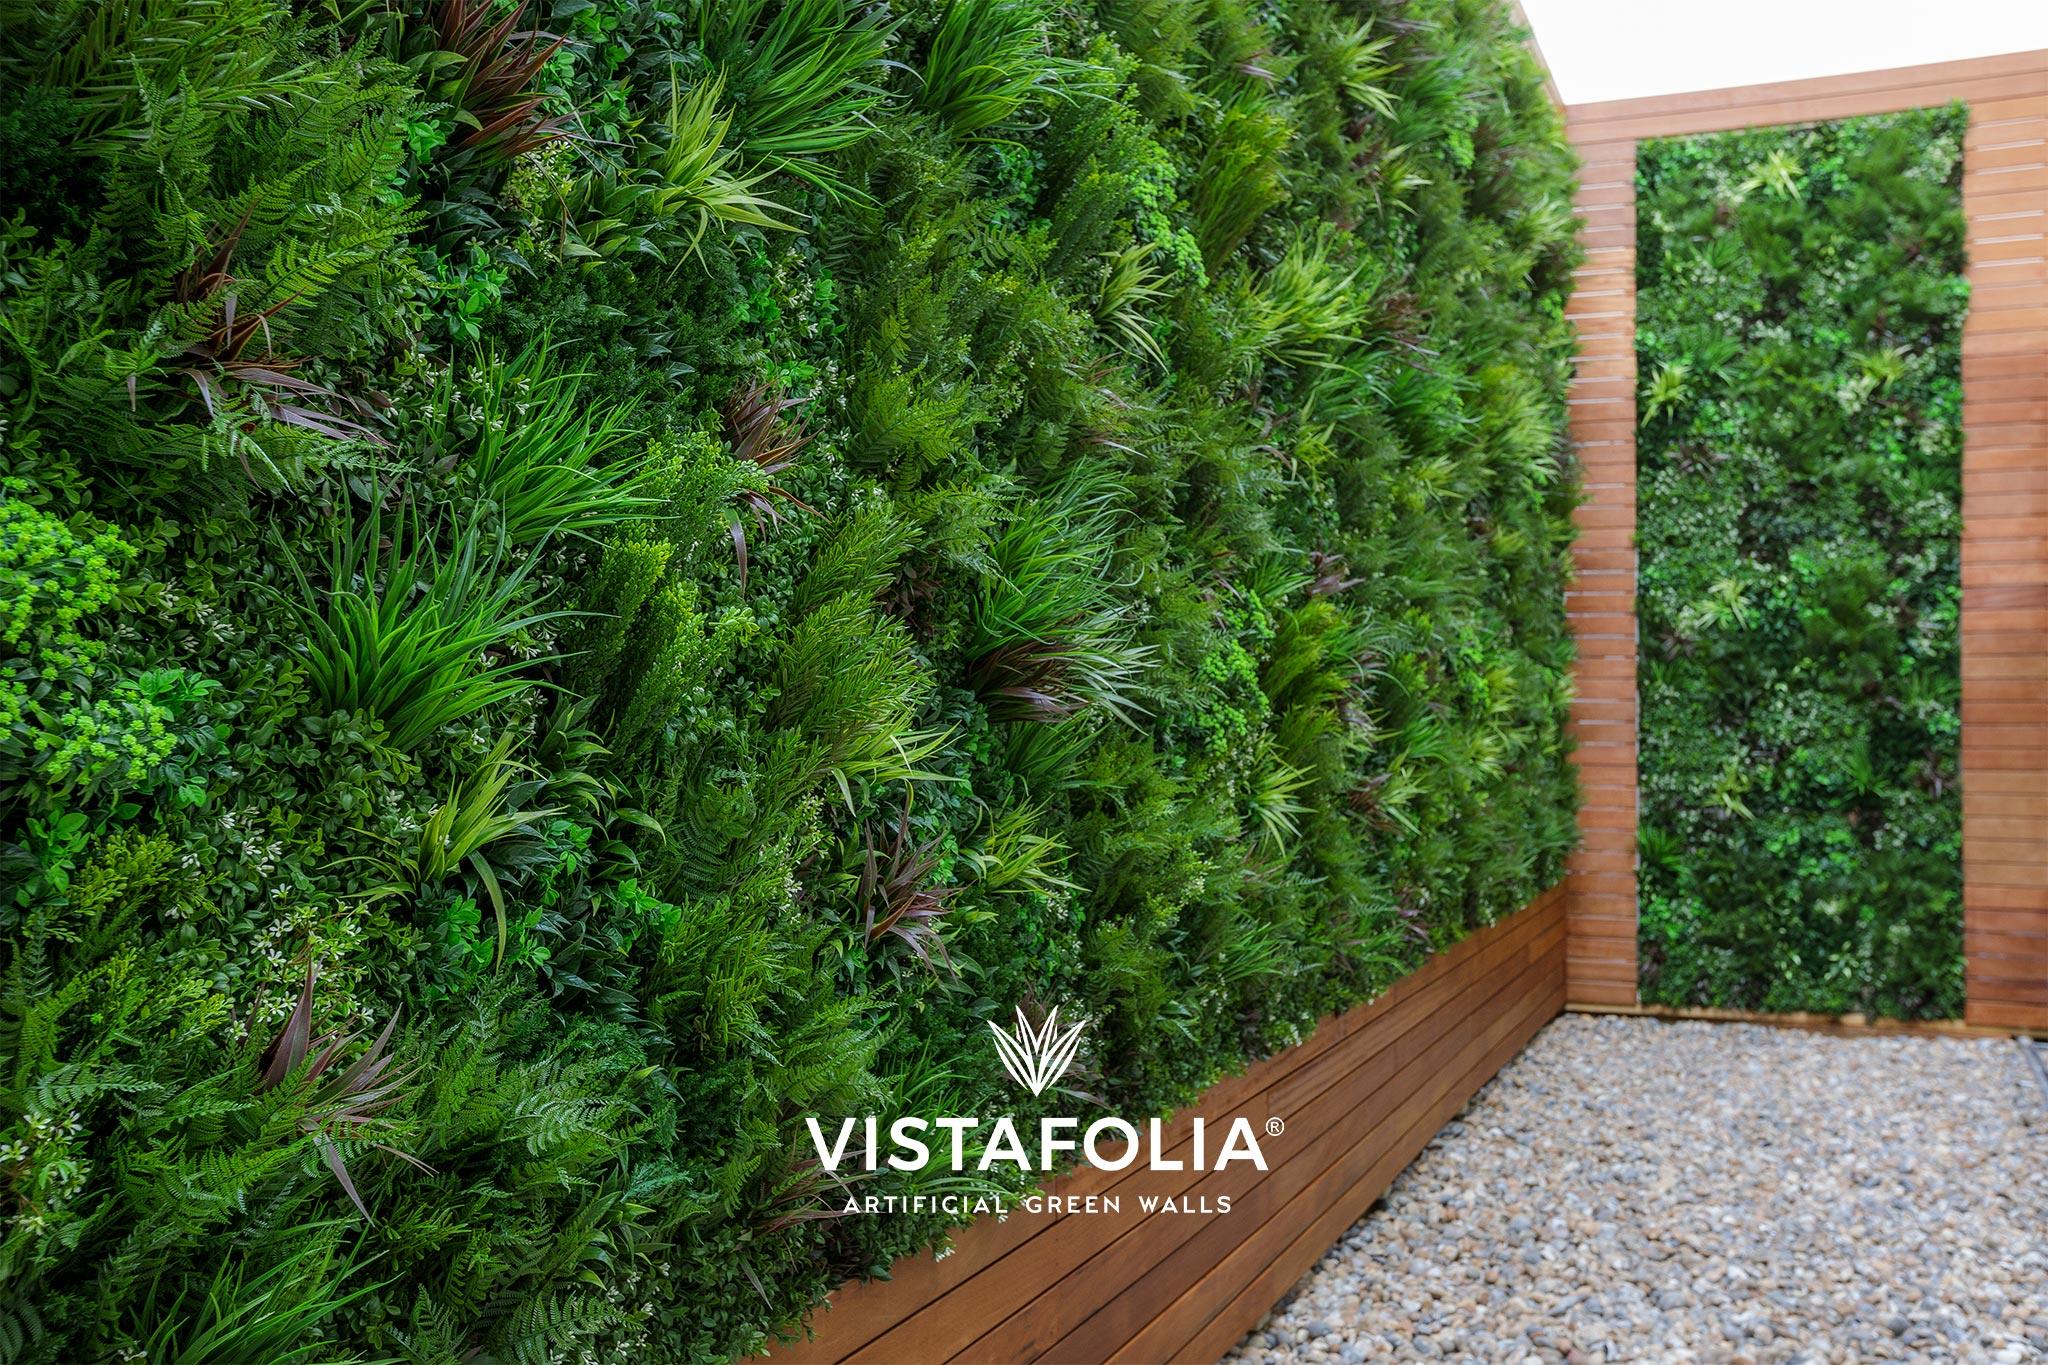 Vistafolia image